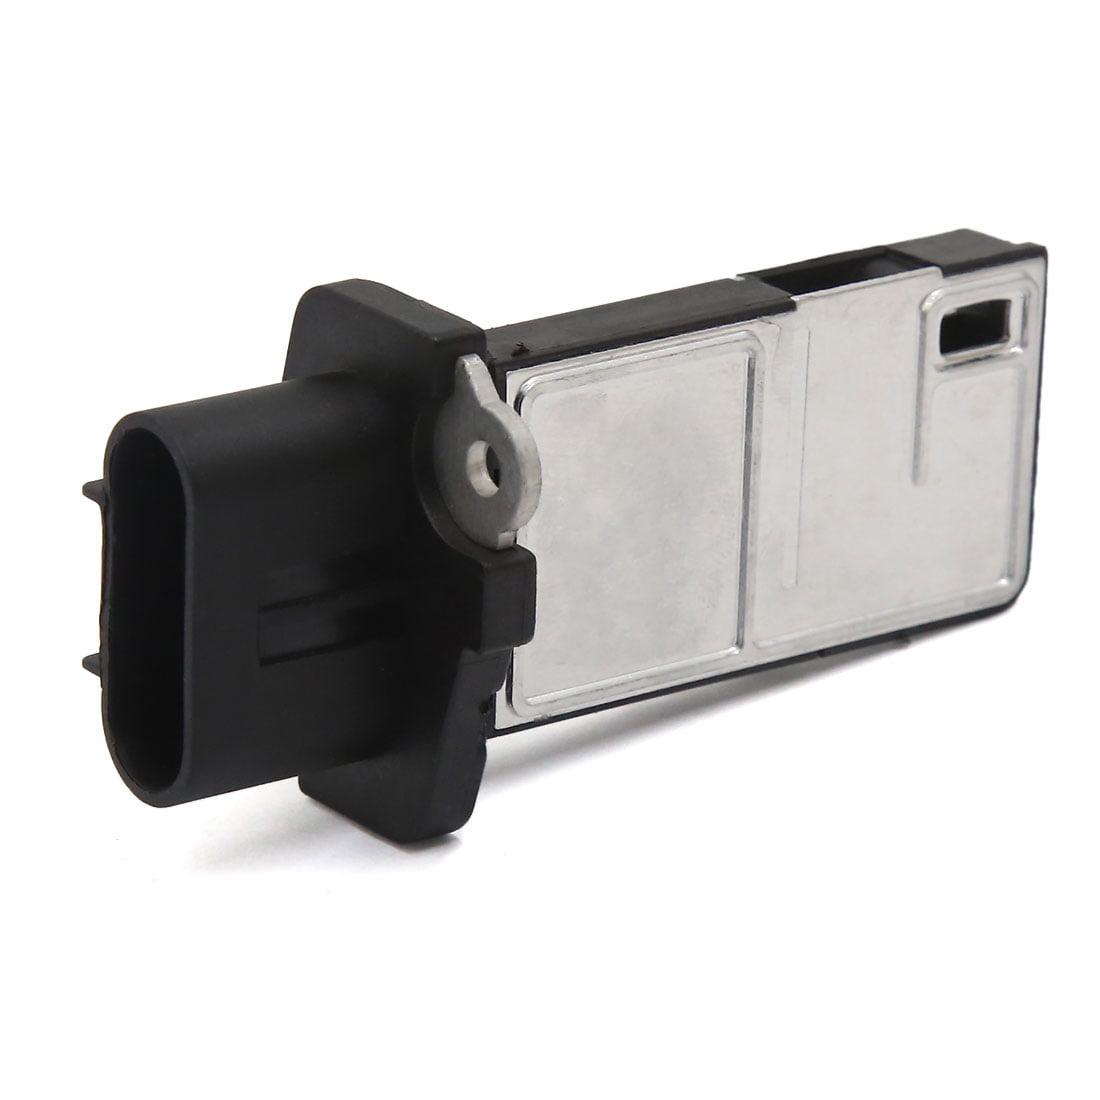 Mass Air Flow Meter MAF Sensor For HUMMER CADILLAC OPEL SAAB CHEVROLET 15865791